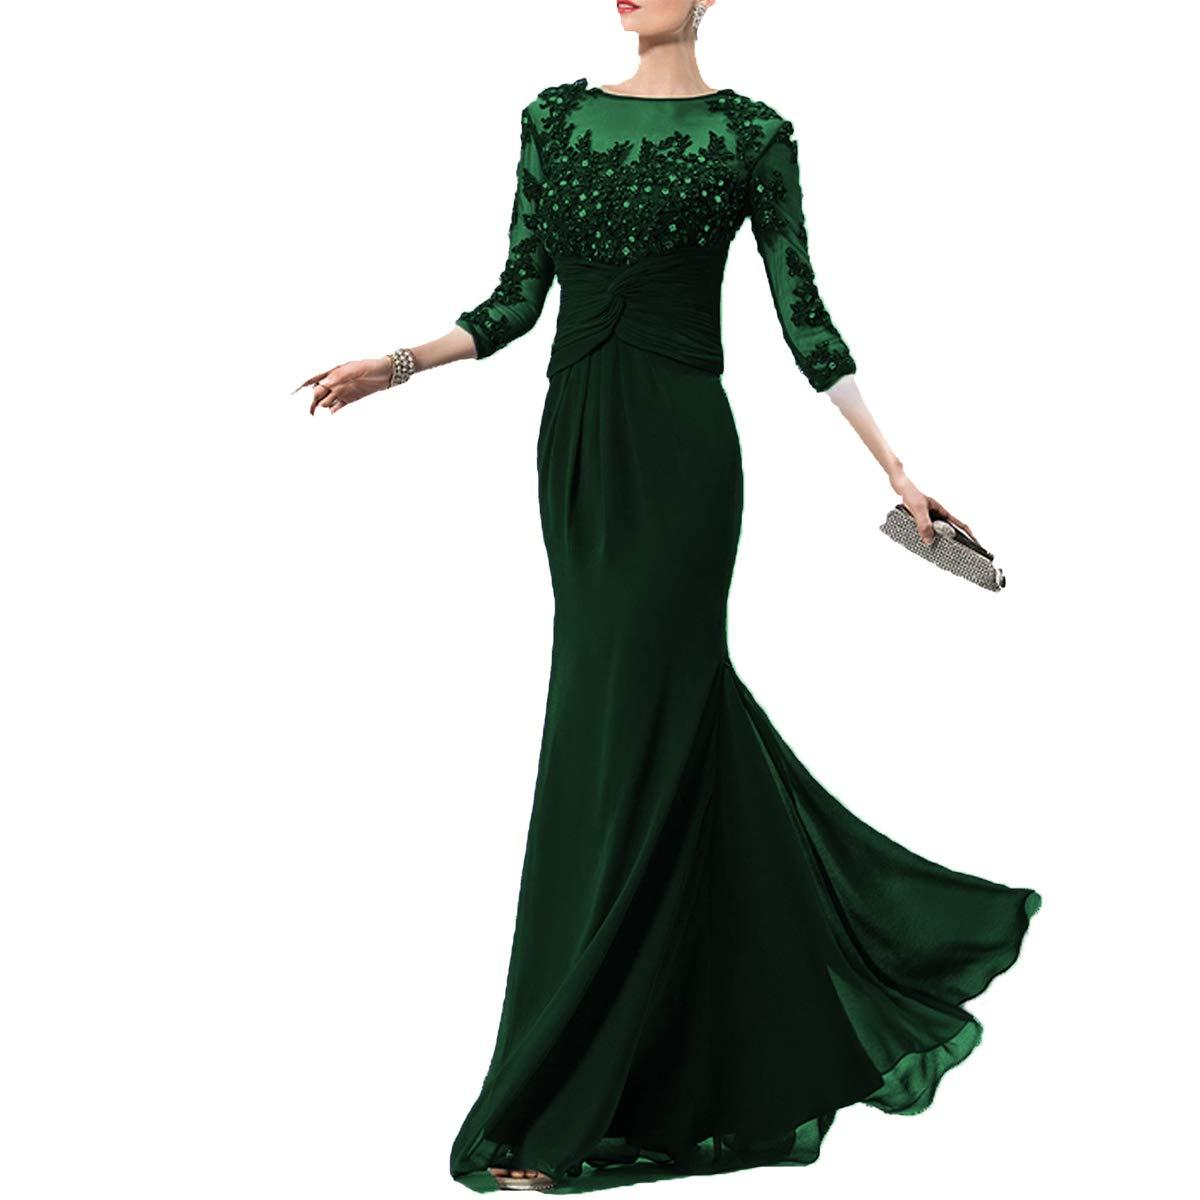 Dark Green SDRESS Women's Rhinestones Appliques Illusion 3 4 Sleeve Scoop Neck Mother Dress